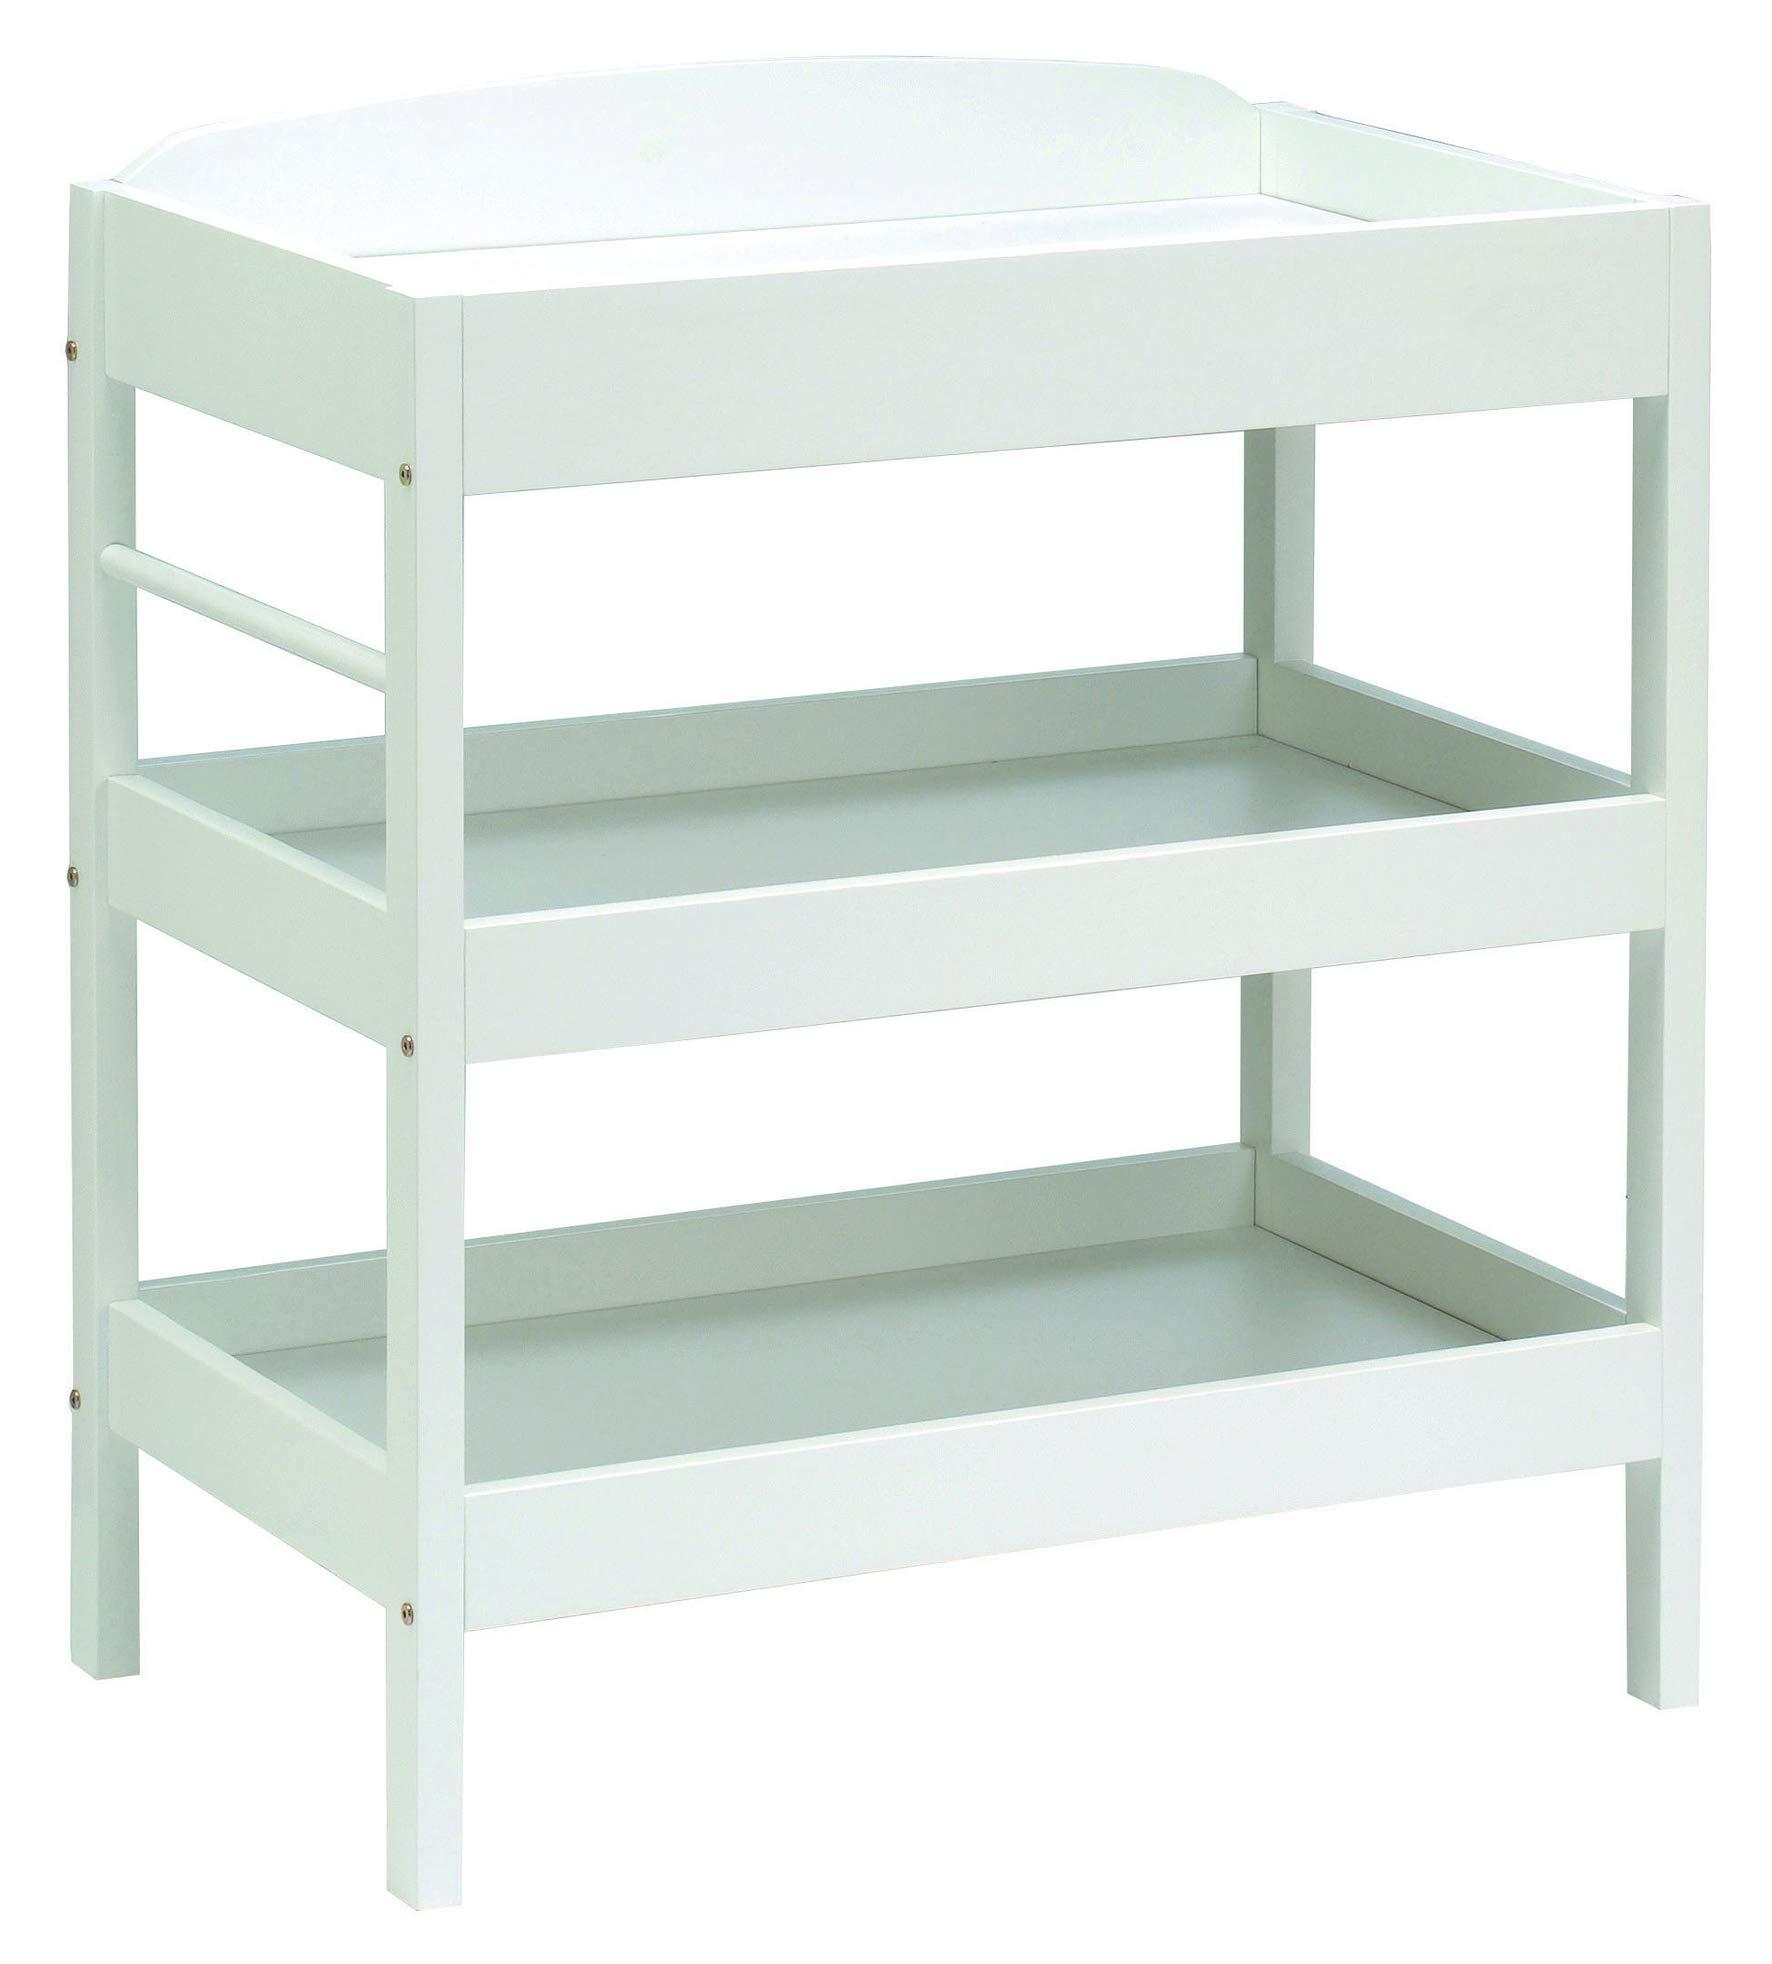 Ikea ONSKLIG 301.992.83 Baby Nursery Changing Table Stor Baskets Set of 6...